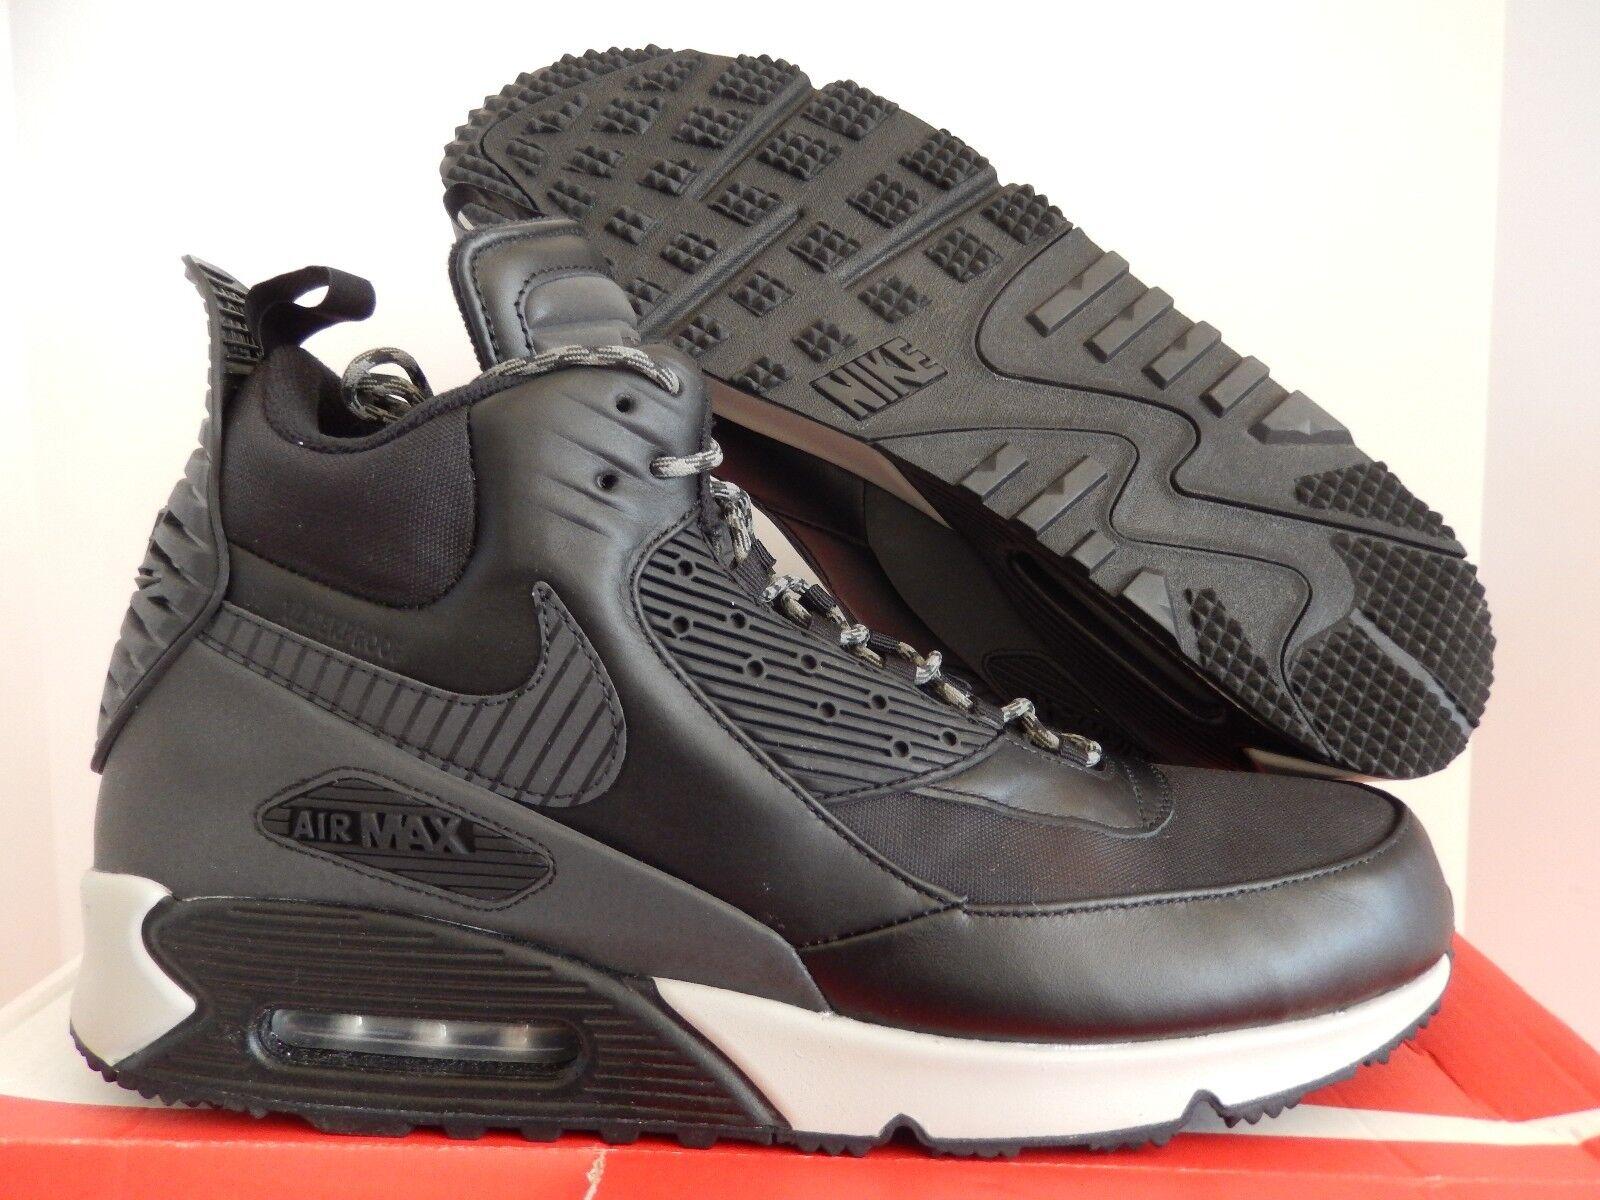 nike air max 90 sneaker boot black/black/magnet grey/black background